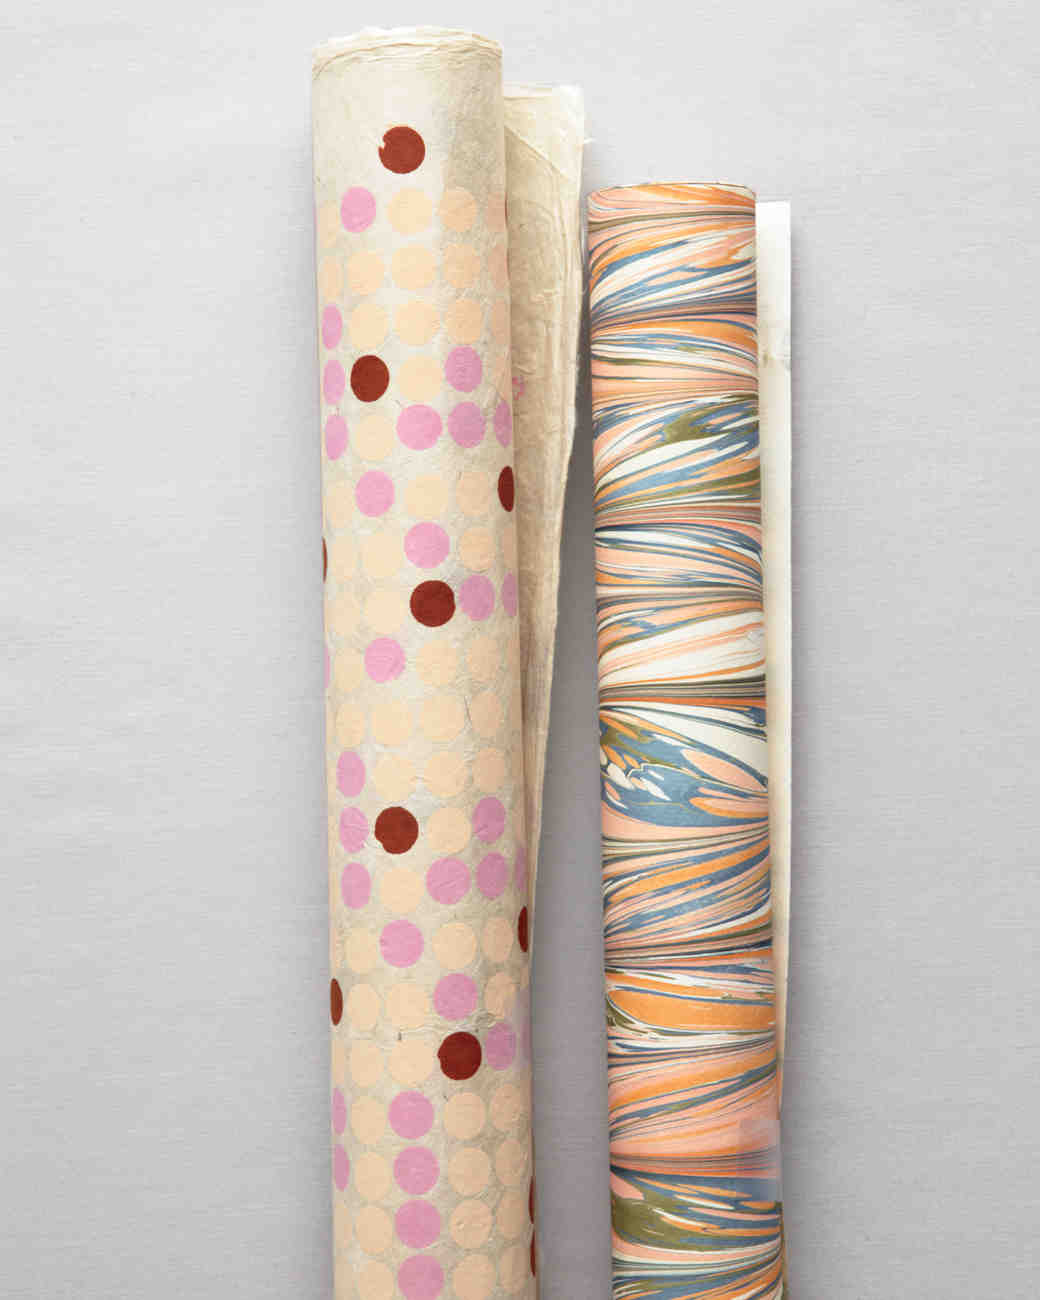 paper-decorative-gt-mwd107748.jpg